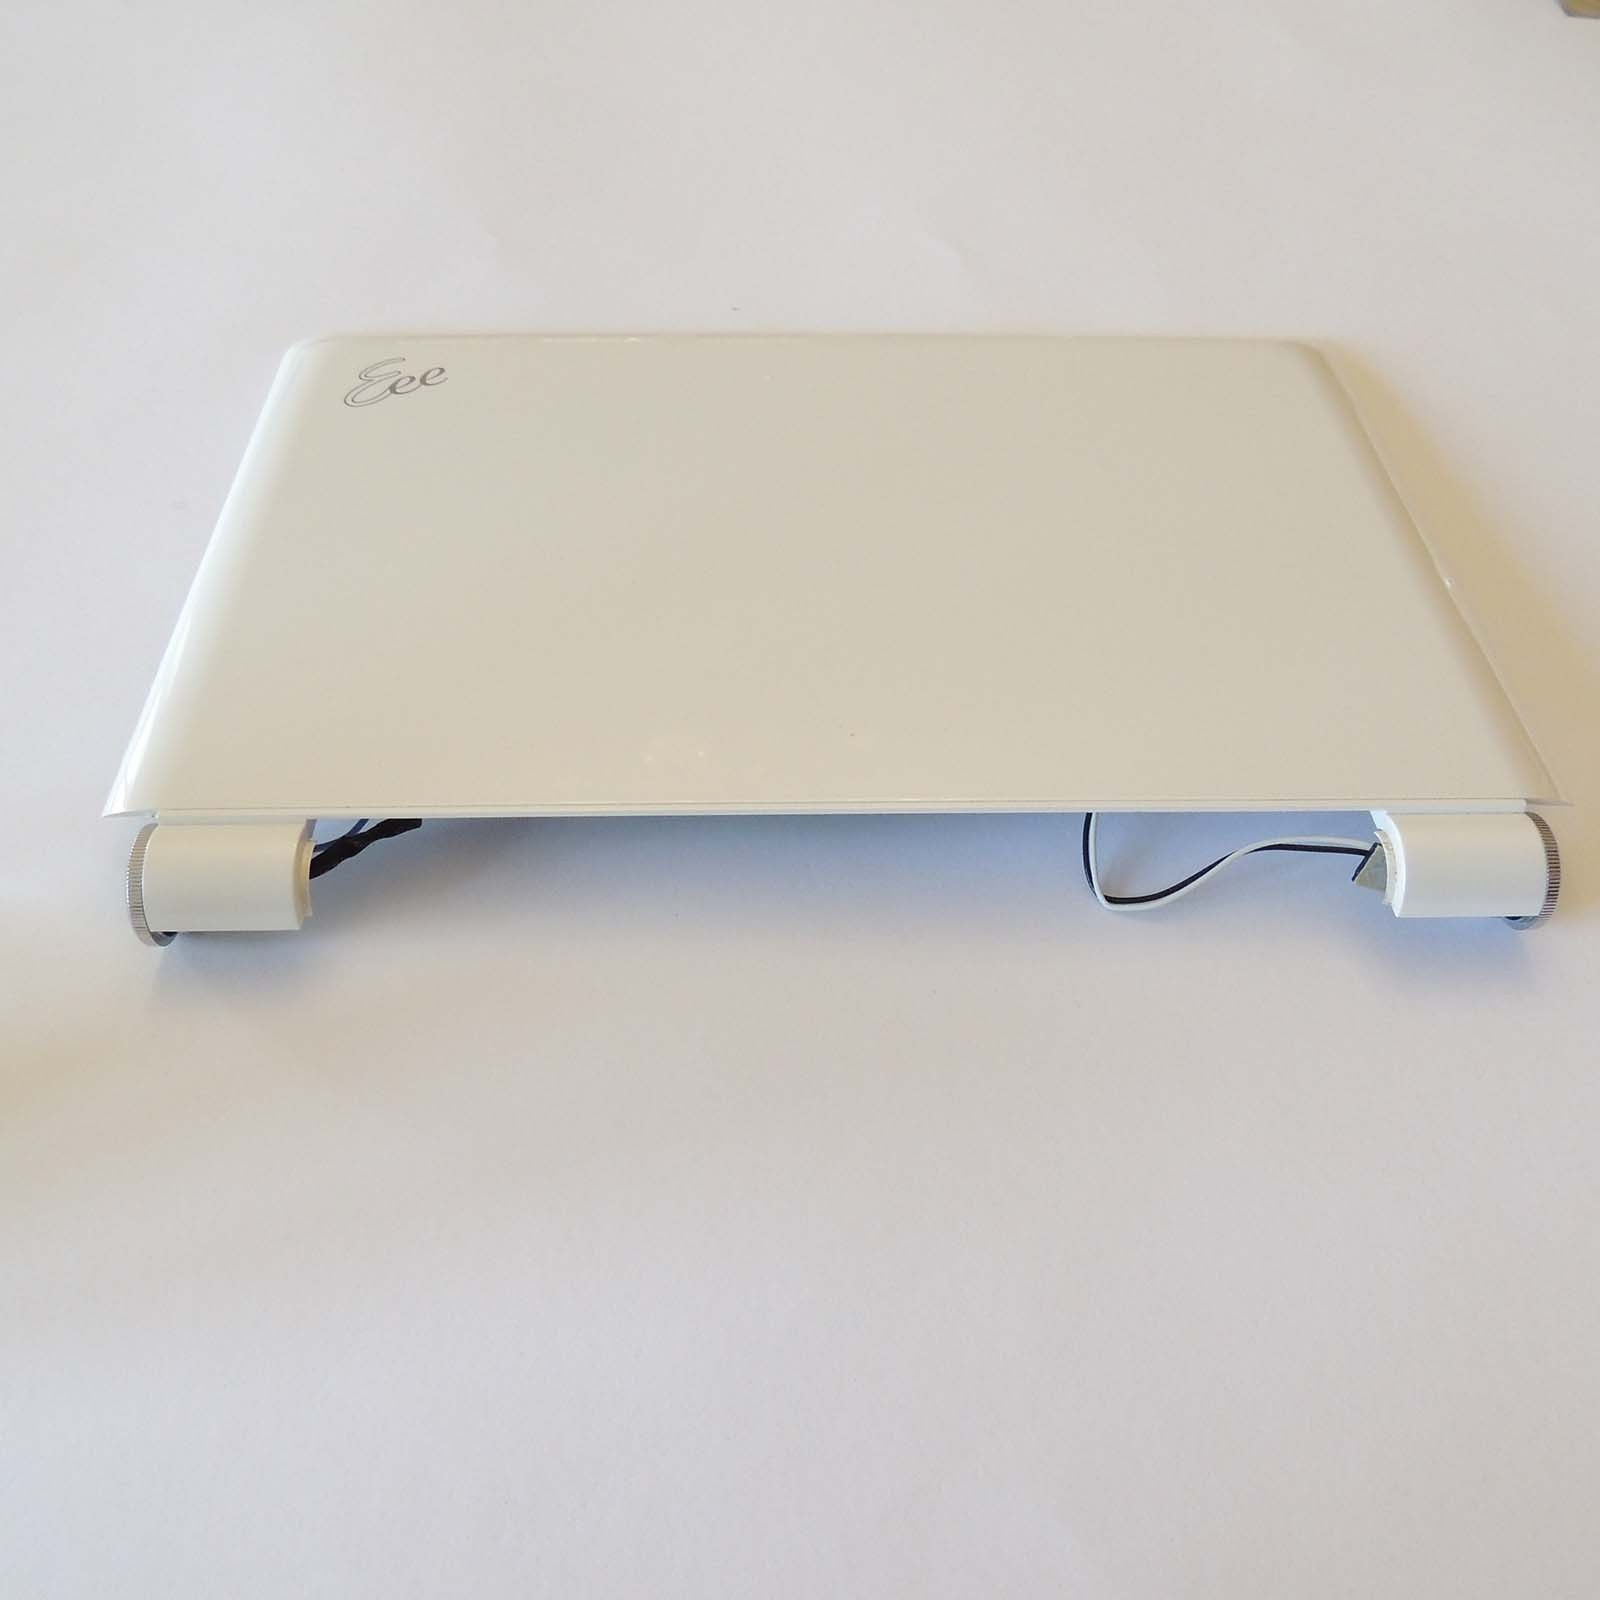 Scocca schermo cover Asus EeePC 1000HG Compresa di Webcam, antenne e Flat